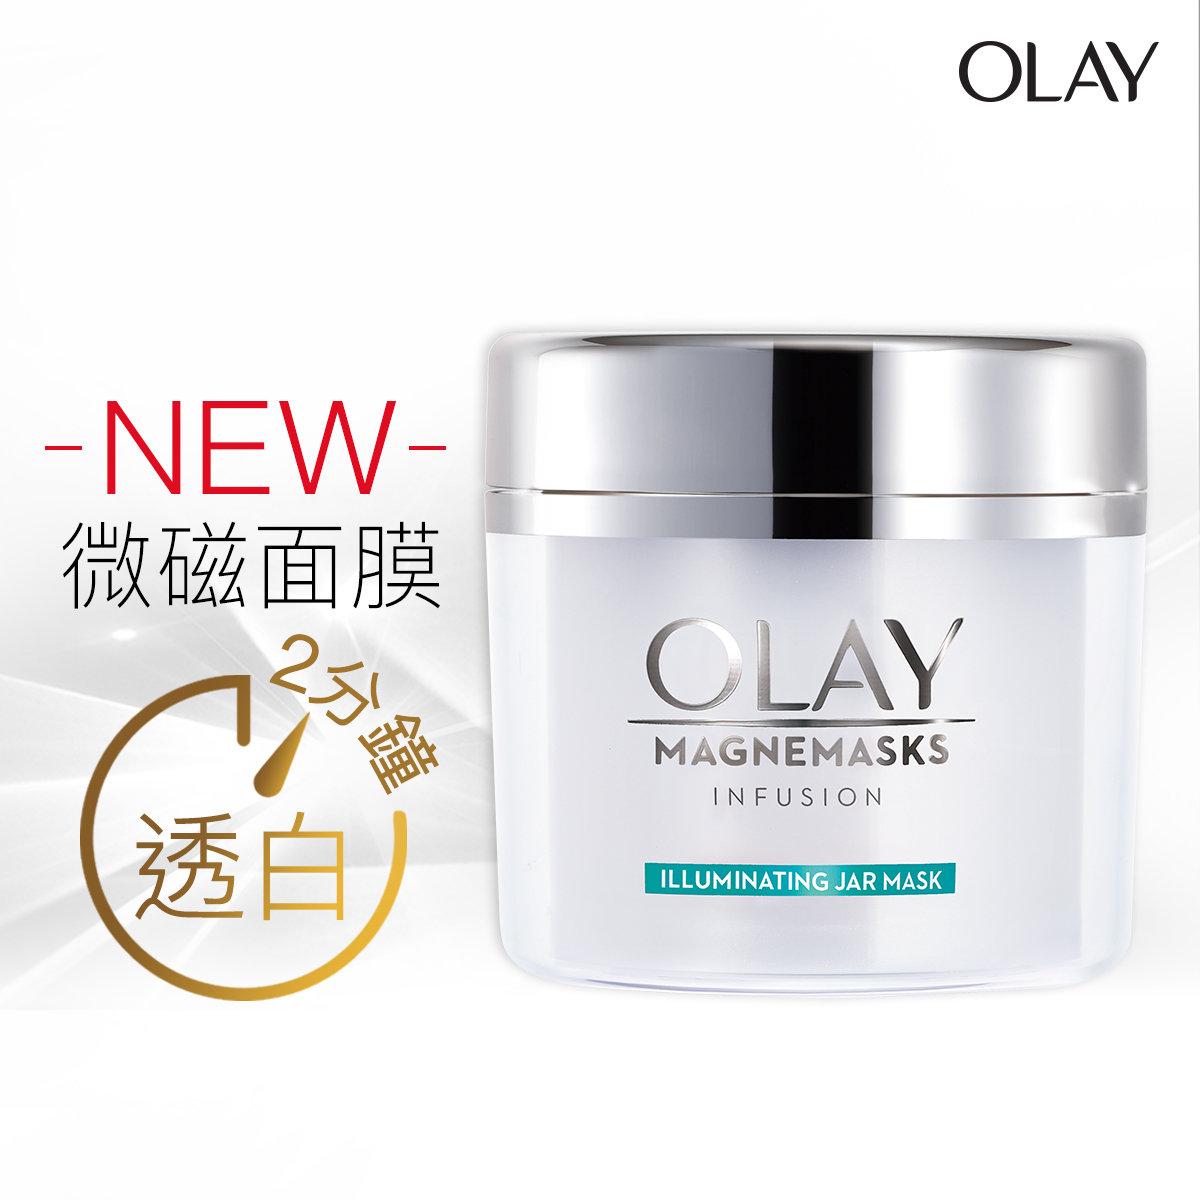 OLAY | Olay Illuminating Jar Mask 130g | HKTVmall Online Shopping